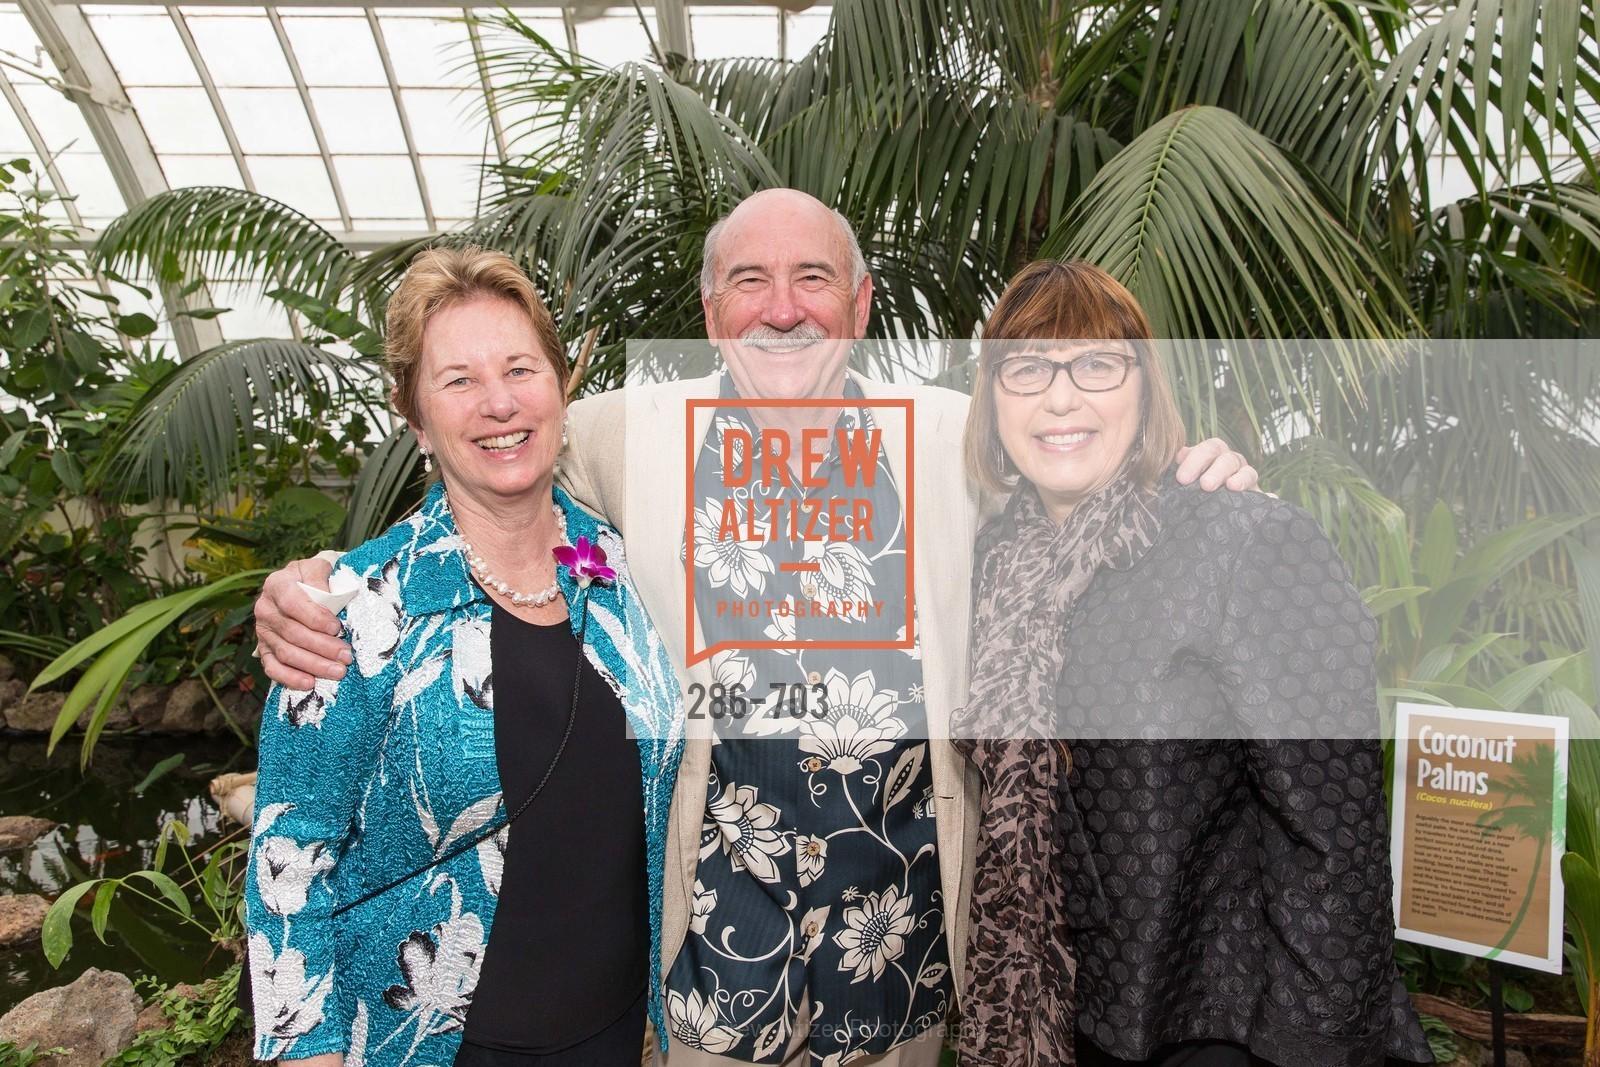 Barbara Derich, Jim Derich, Sheila Bertram, CONSERVATORY OF FLOWERS Presents